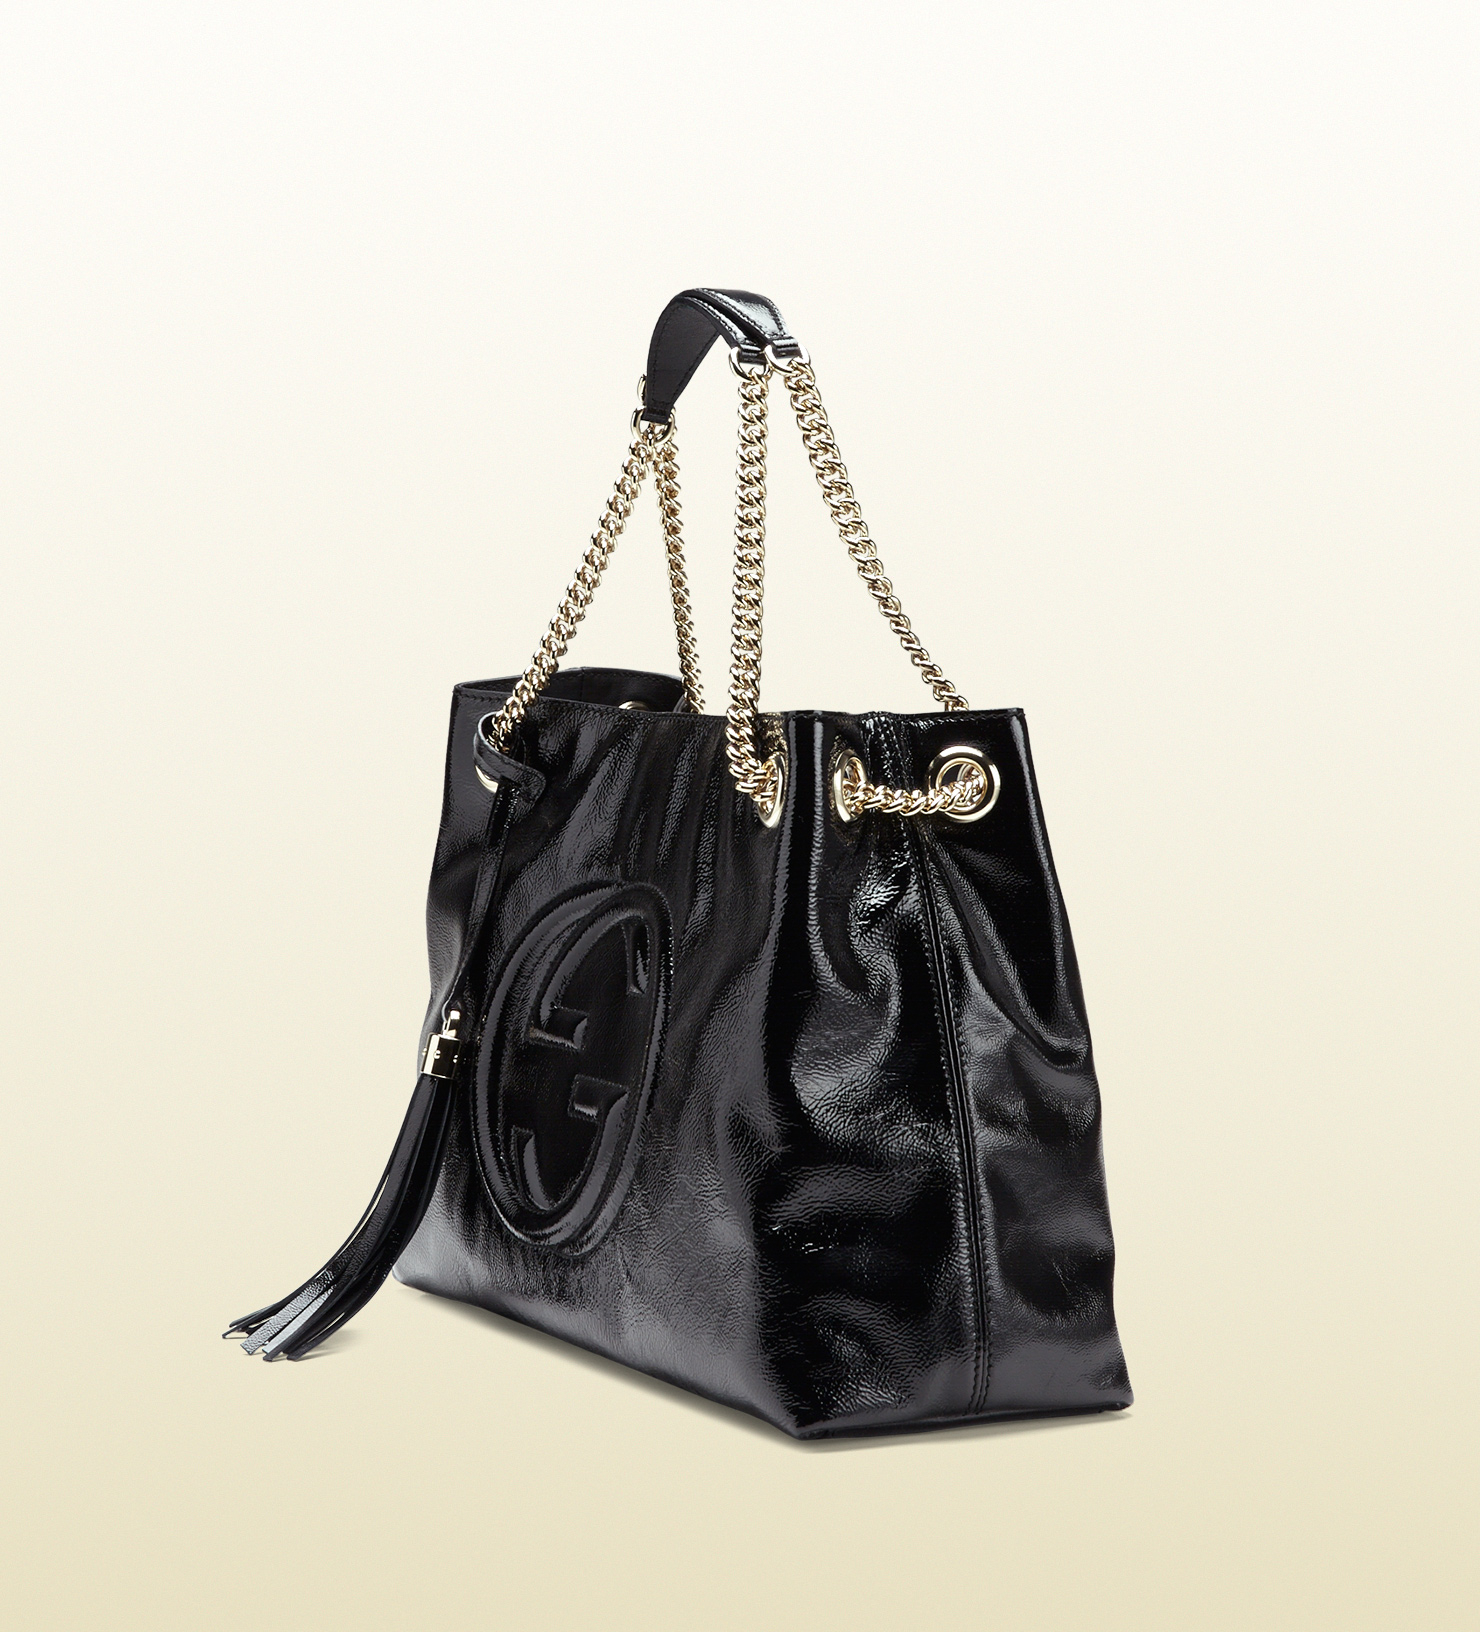 gucci soho soft patent leather shoulder bag in black